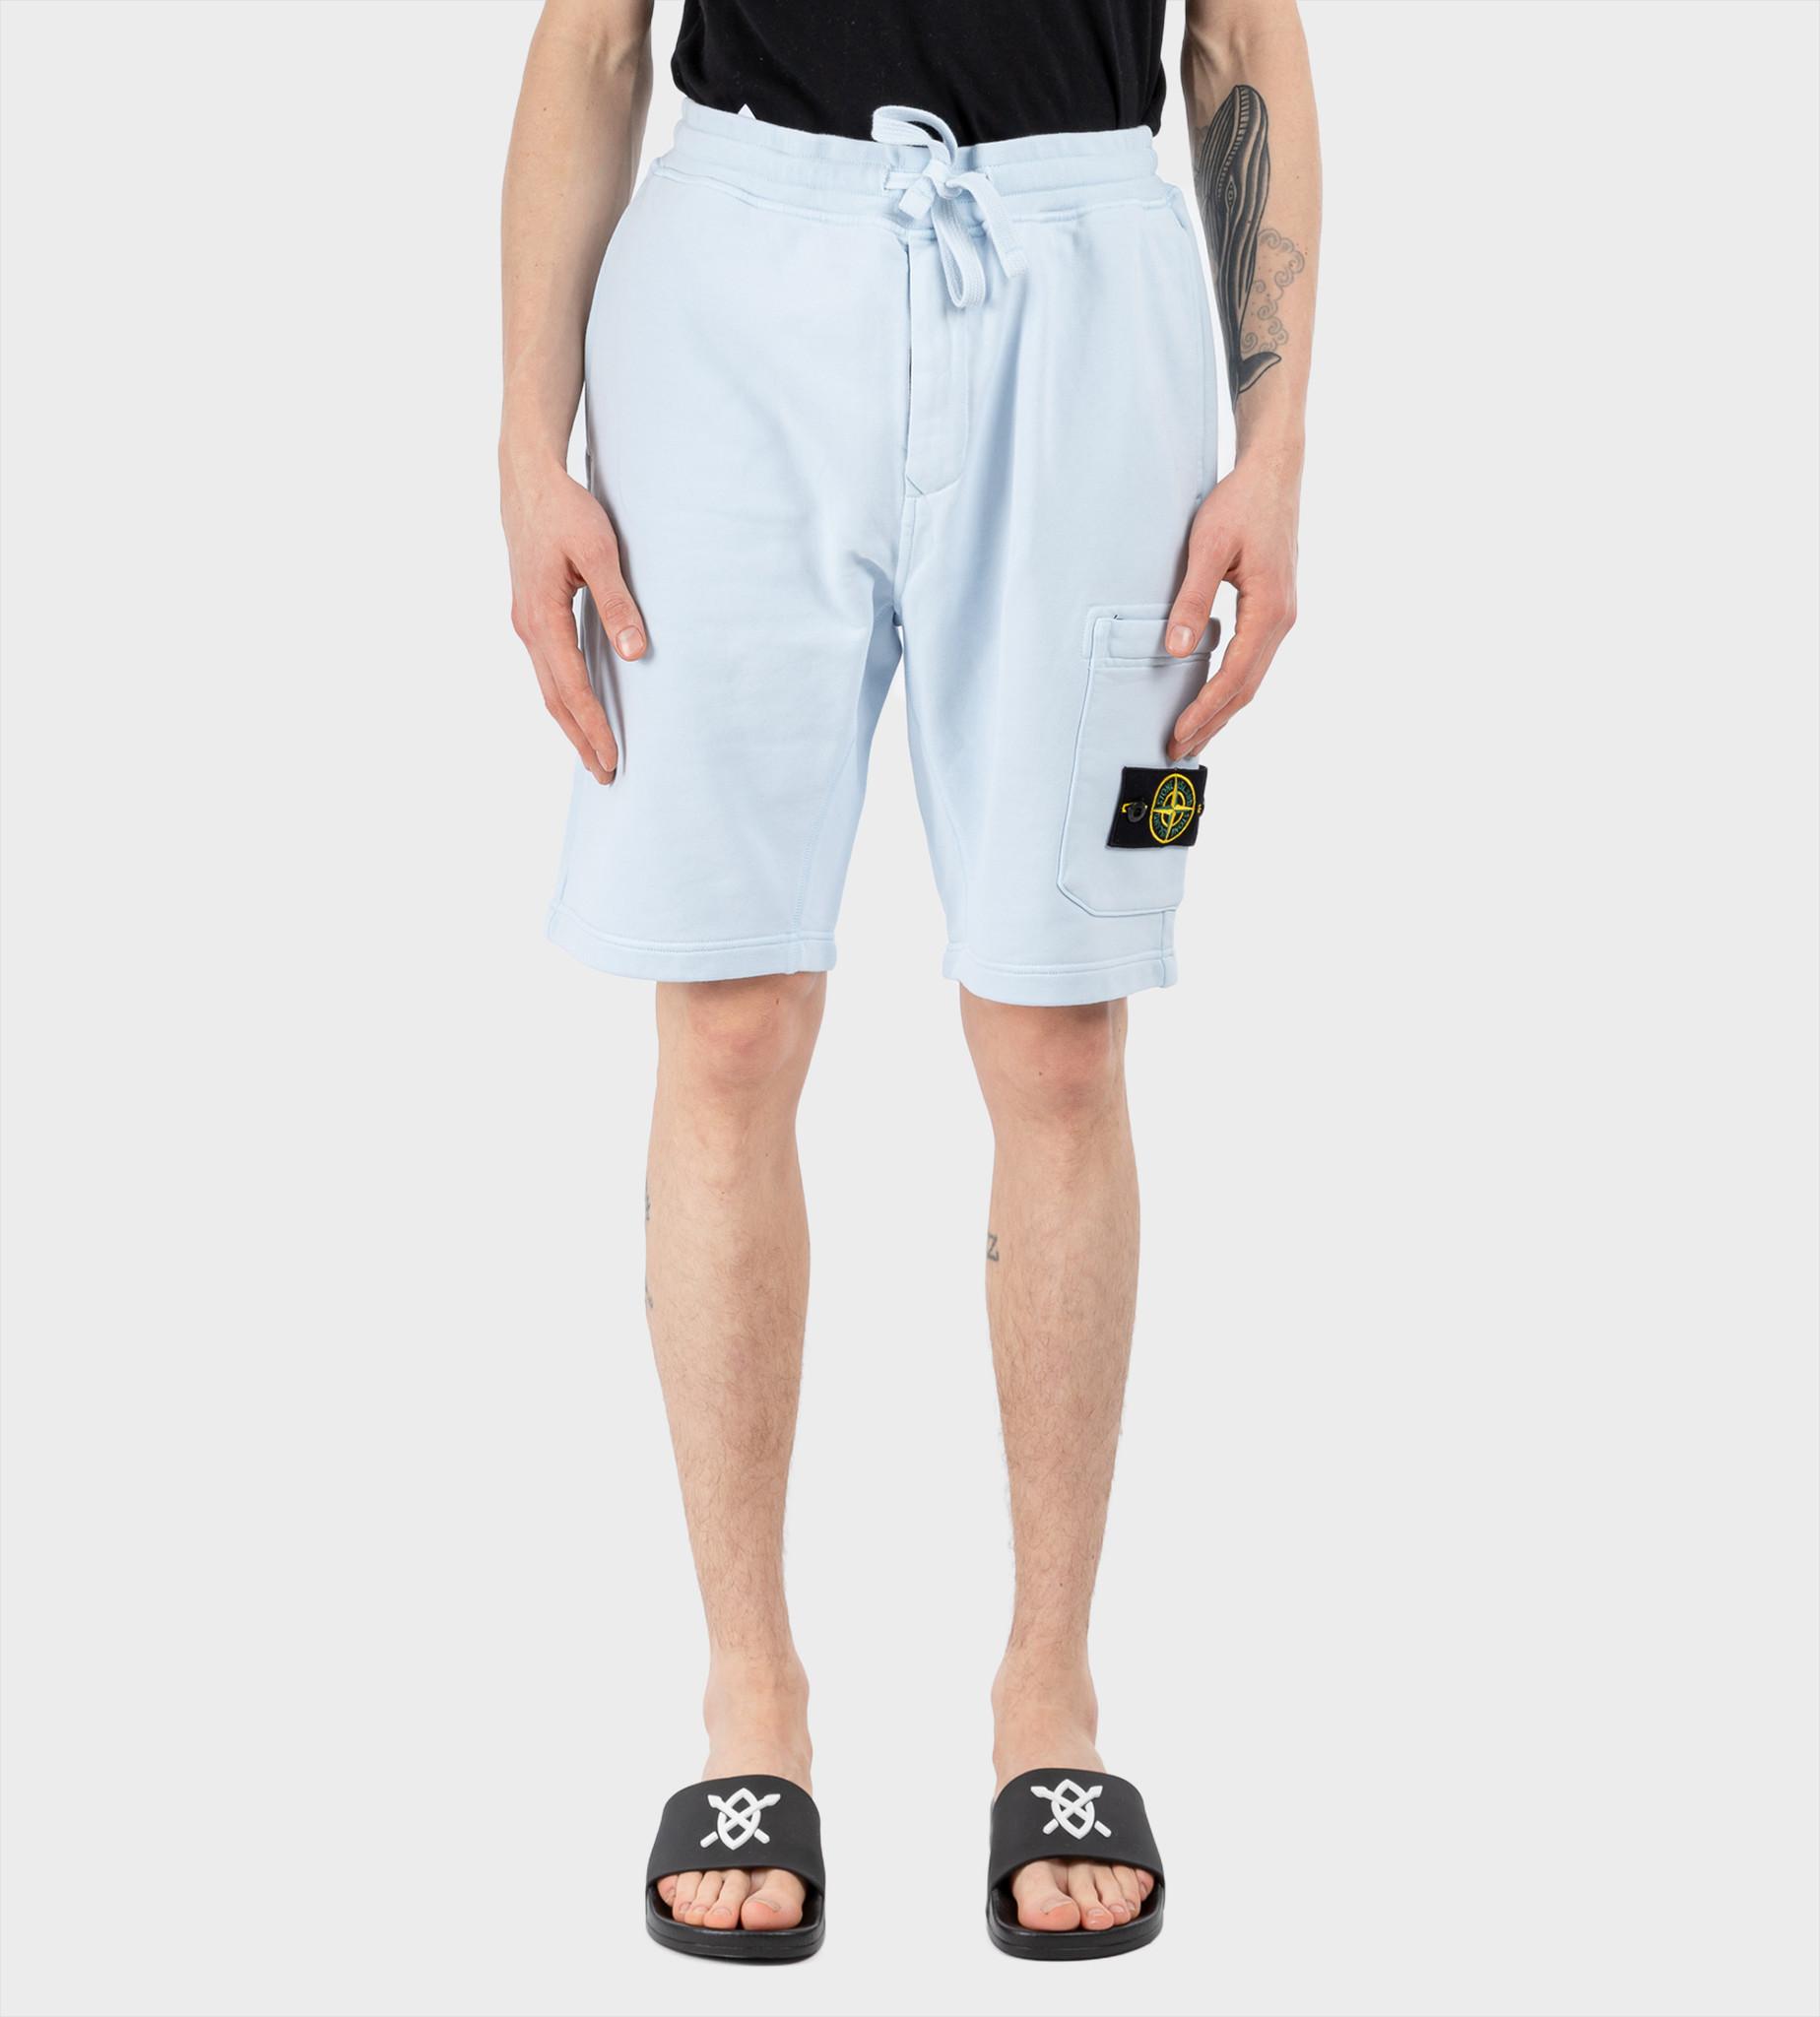 STONE ISLAND Bermuda Shorts  Light Blue